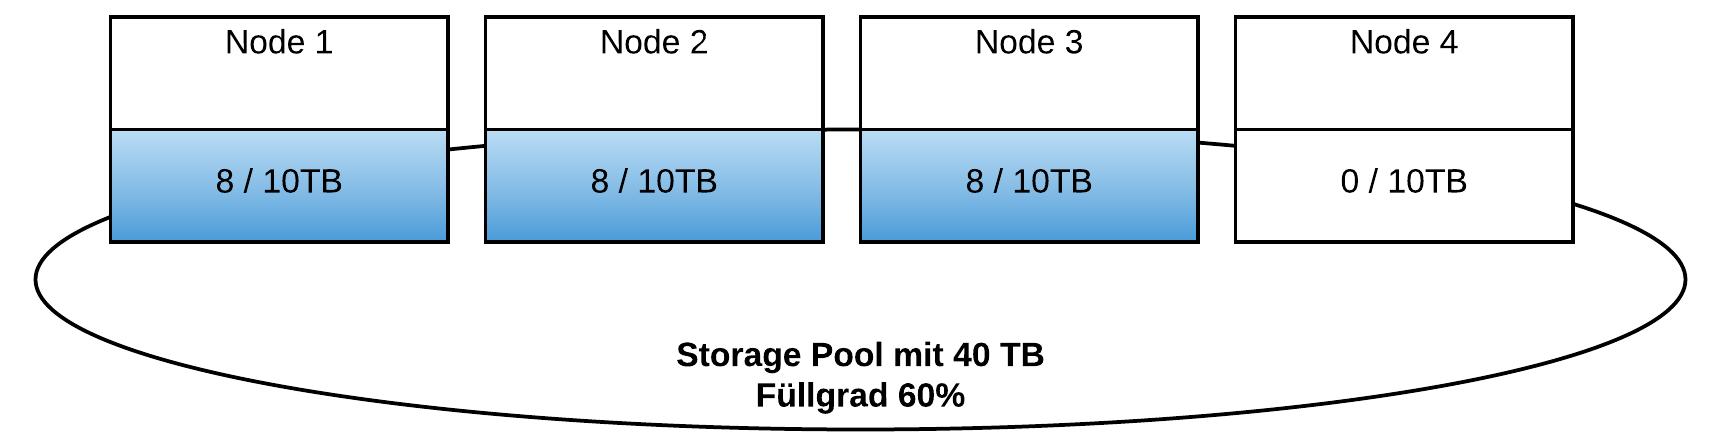 ntnx_storagepool_2